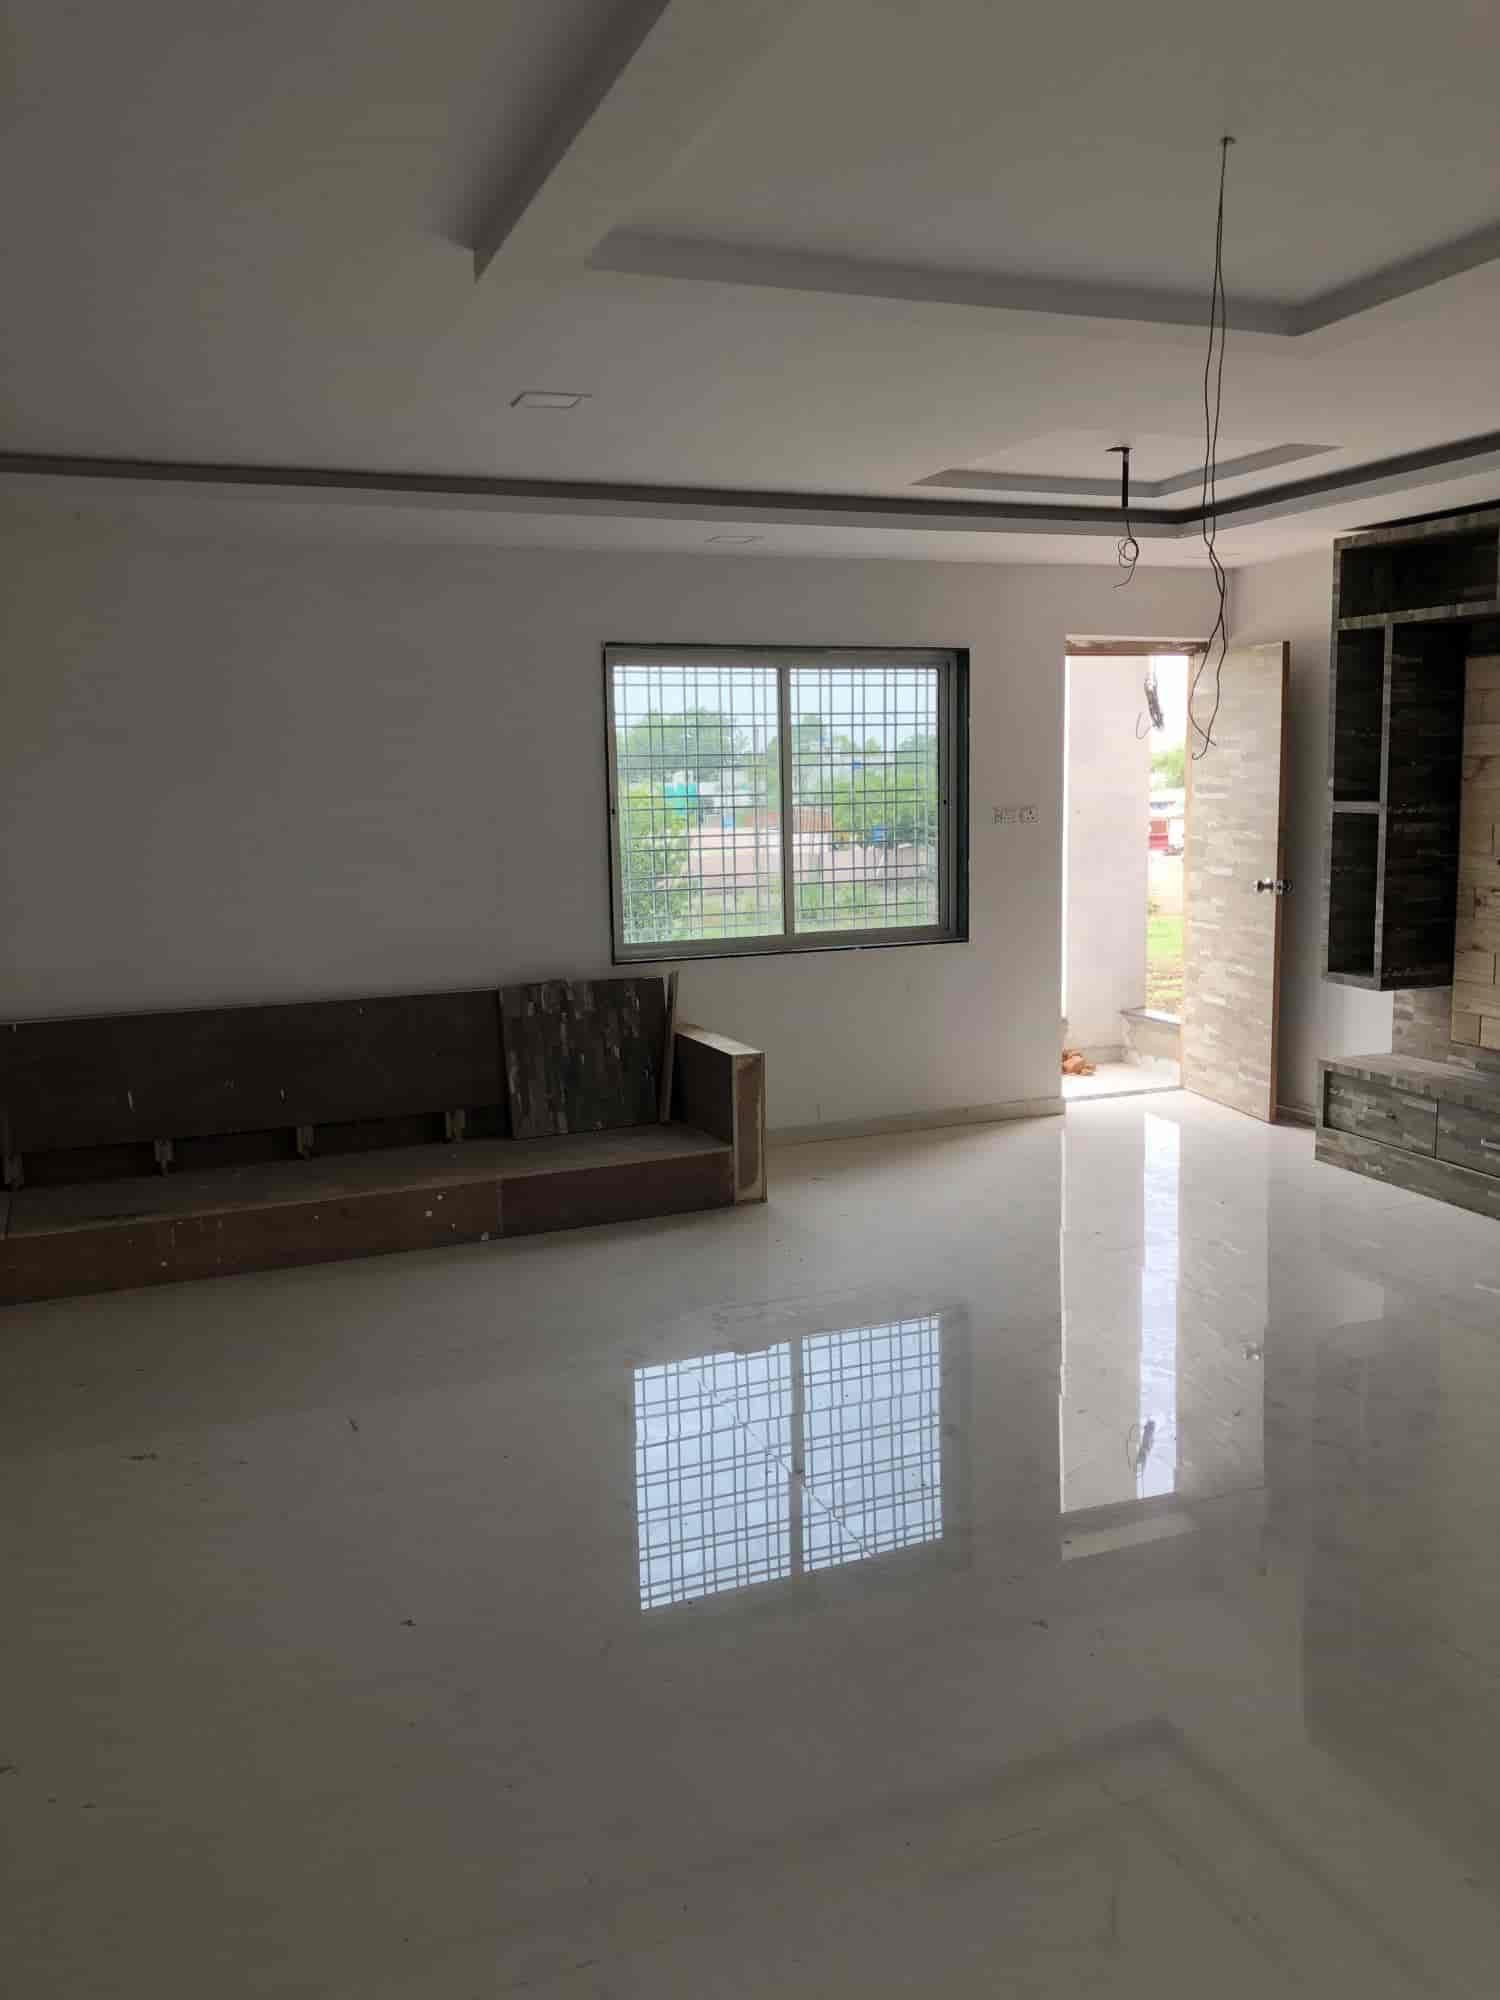 Deco Design Studio Photos, Central Avenue Road, Nagpur- Pictures ...